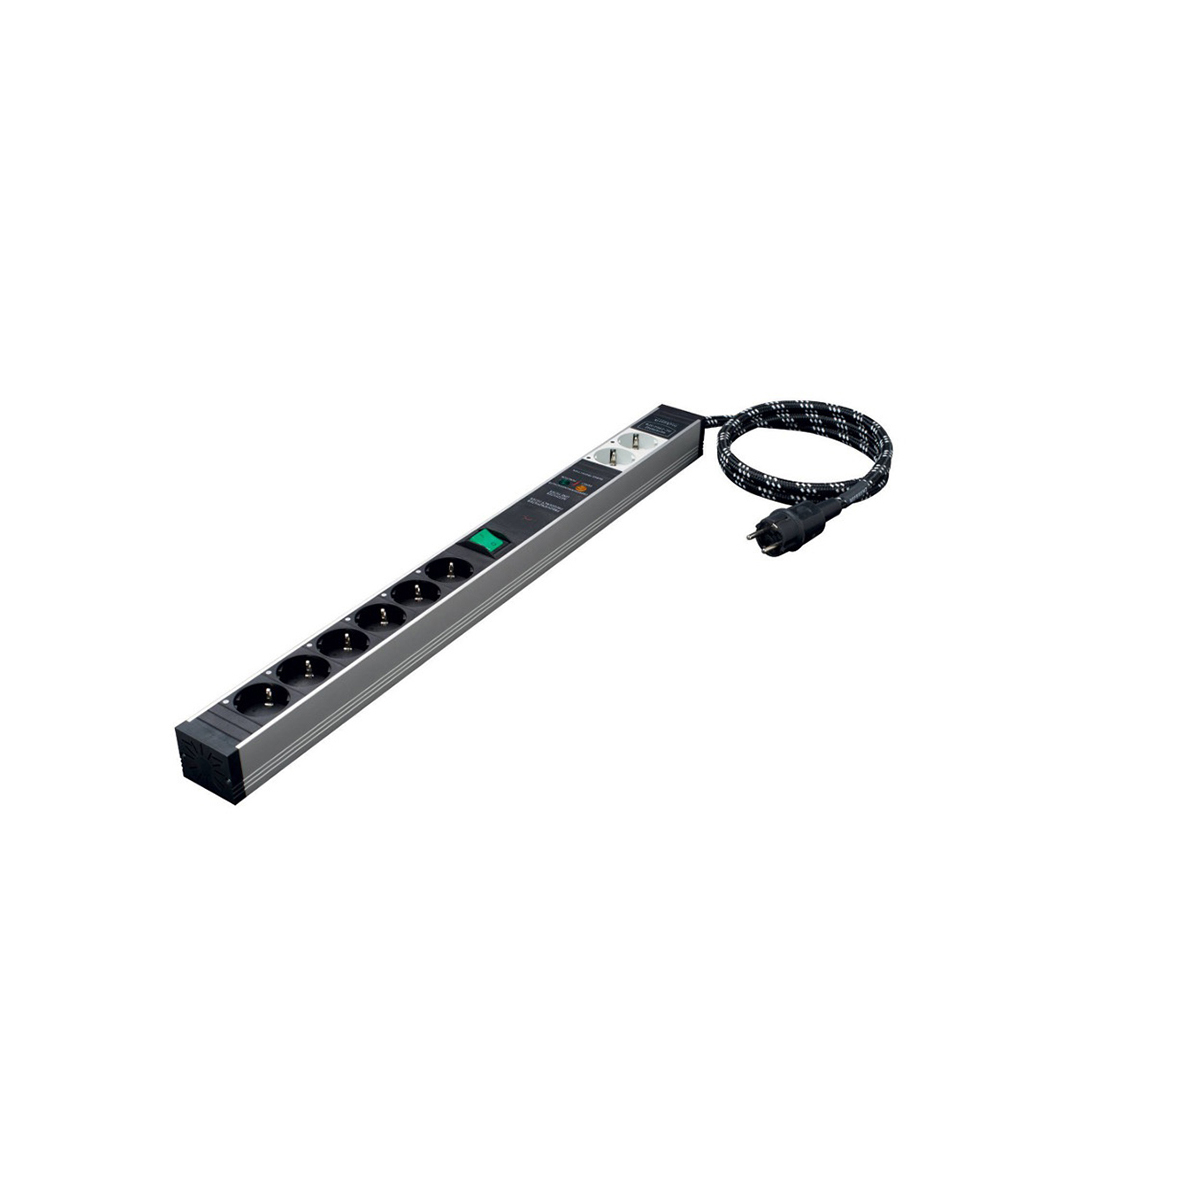 INAKUSTIK Referenz Power Bar AC-2502-SF8 3x2,5mm